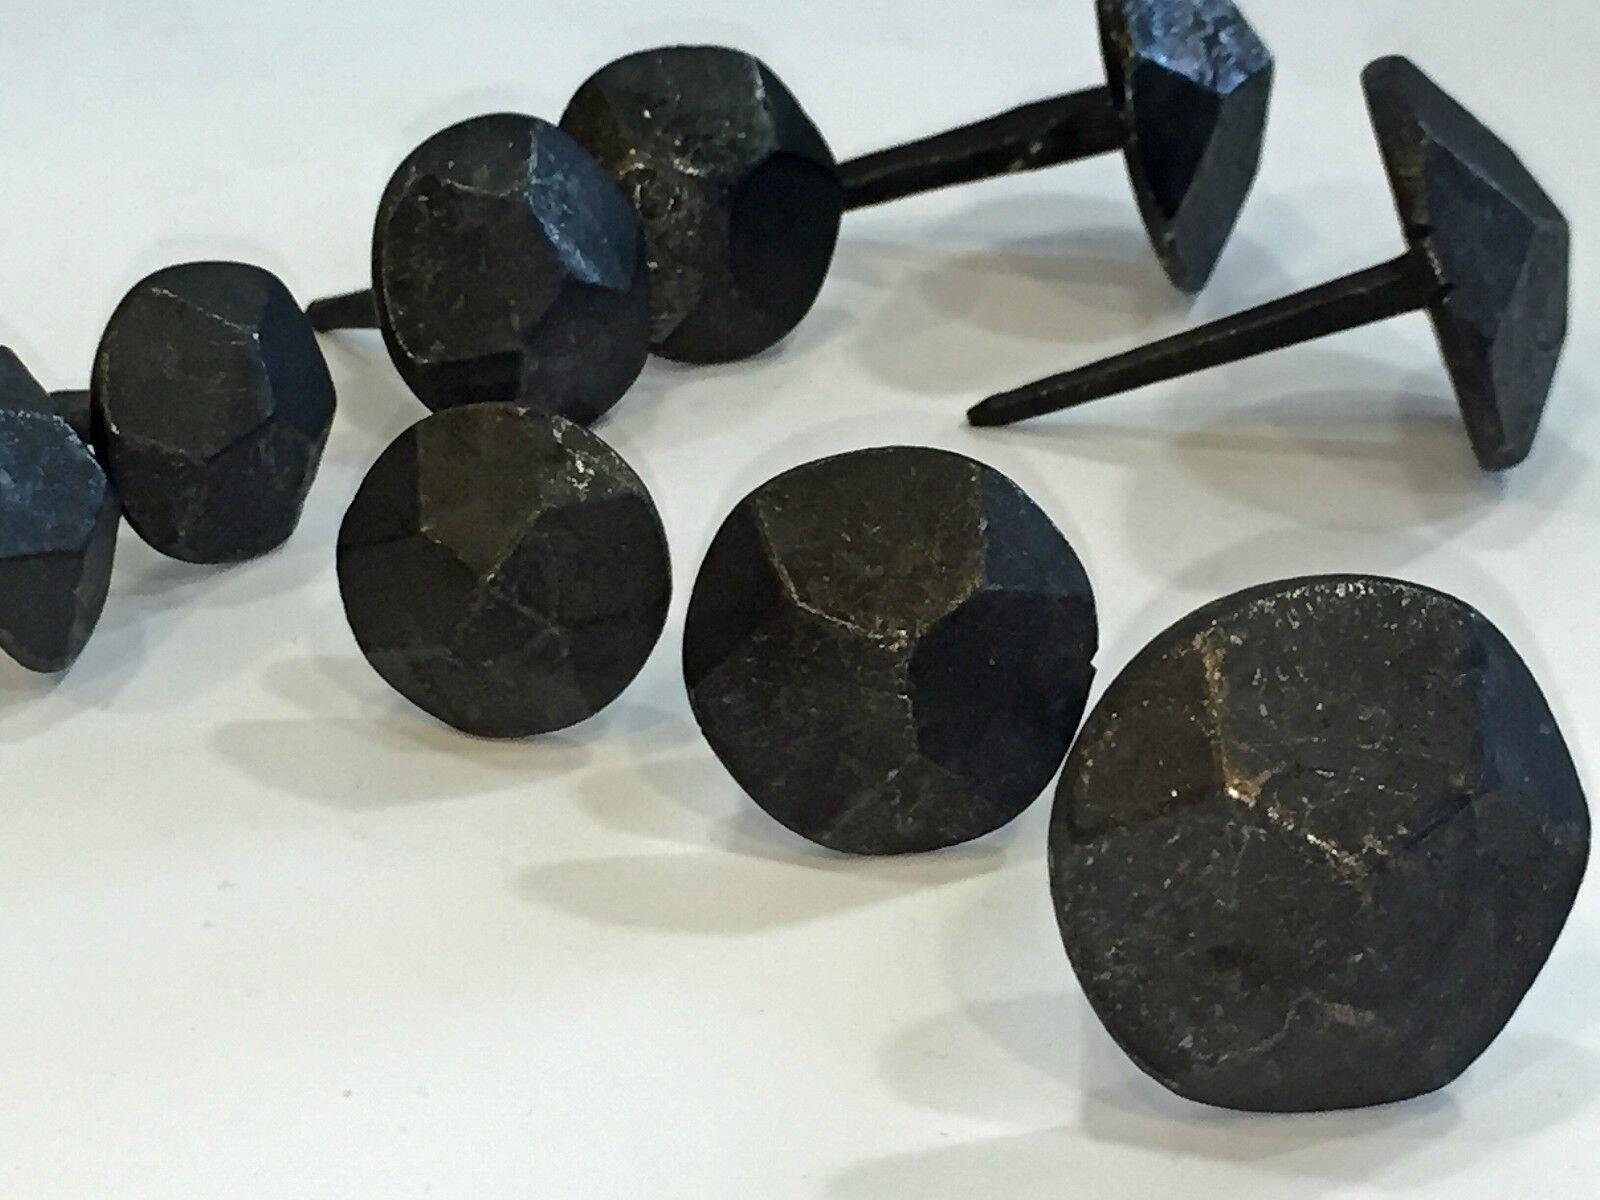 ZierNägel Zierkopfnägel HANDgeschmiedet made in Germany rustikal schwarz